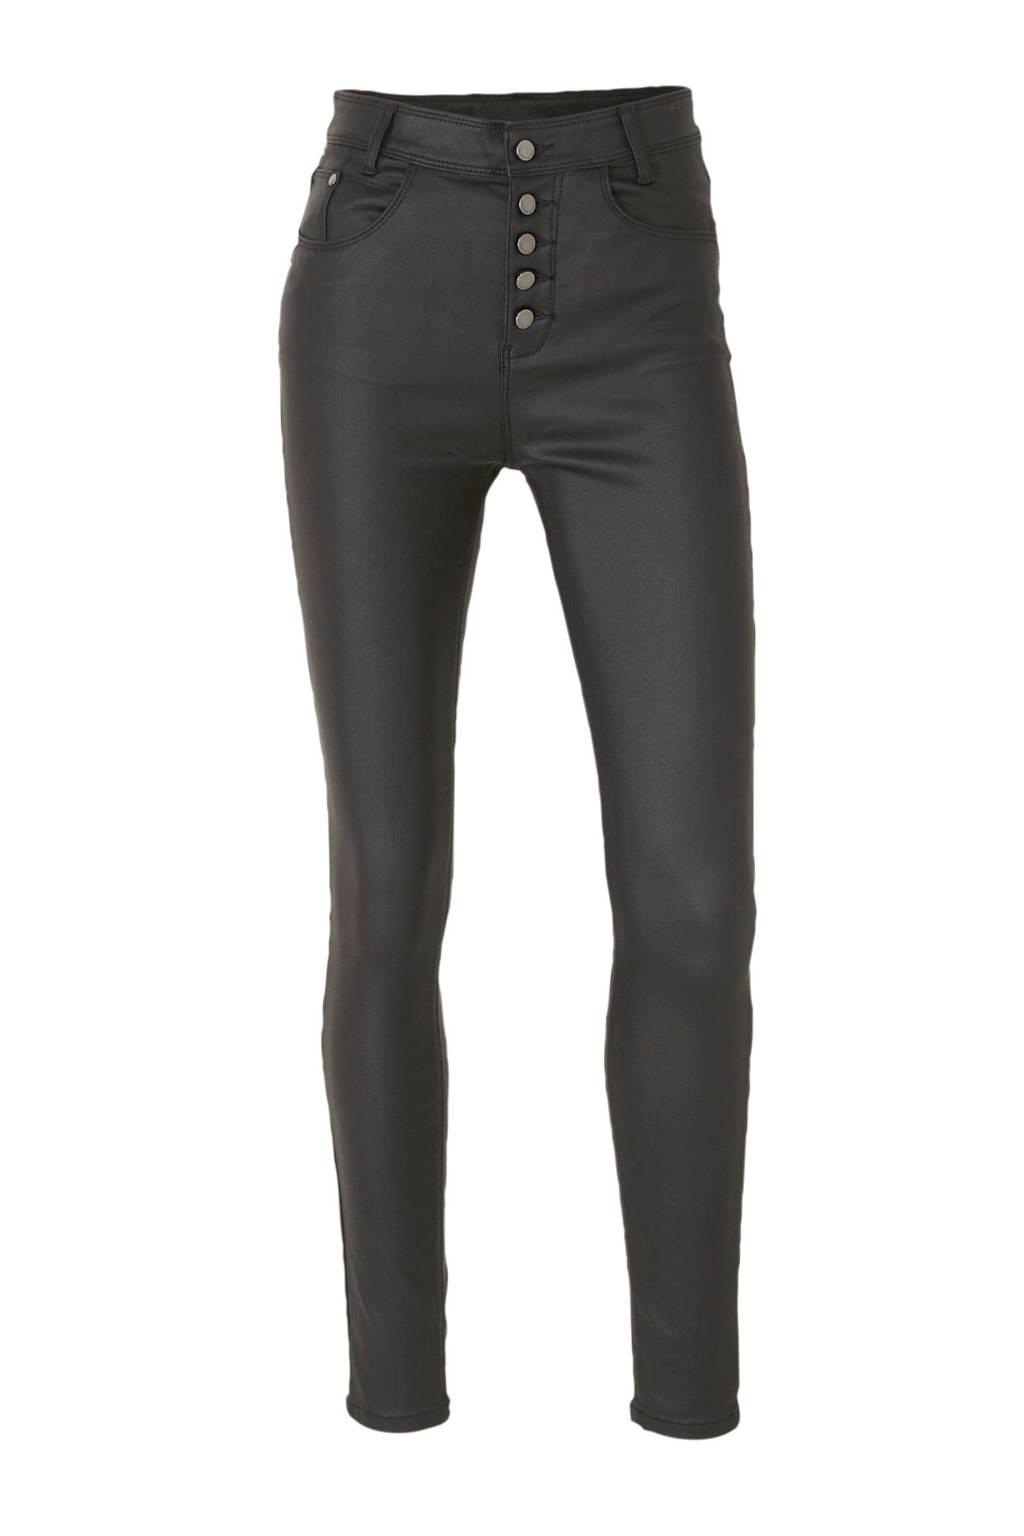 C&A Yessica coated high waist skinny broek zwart, Zwart